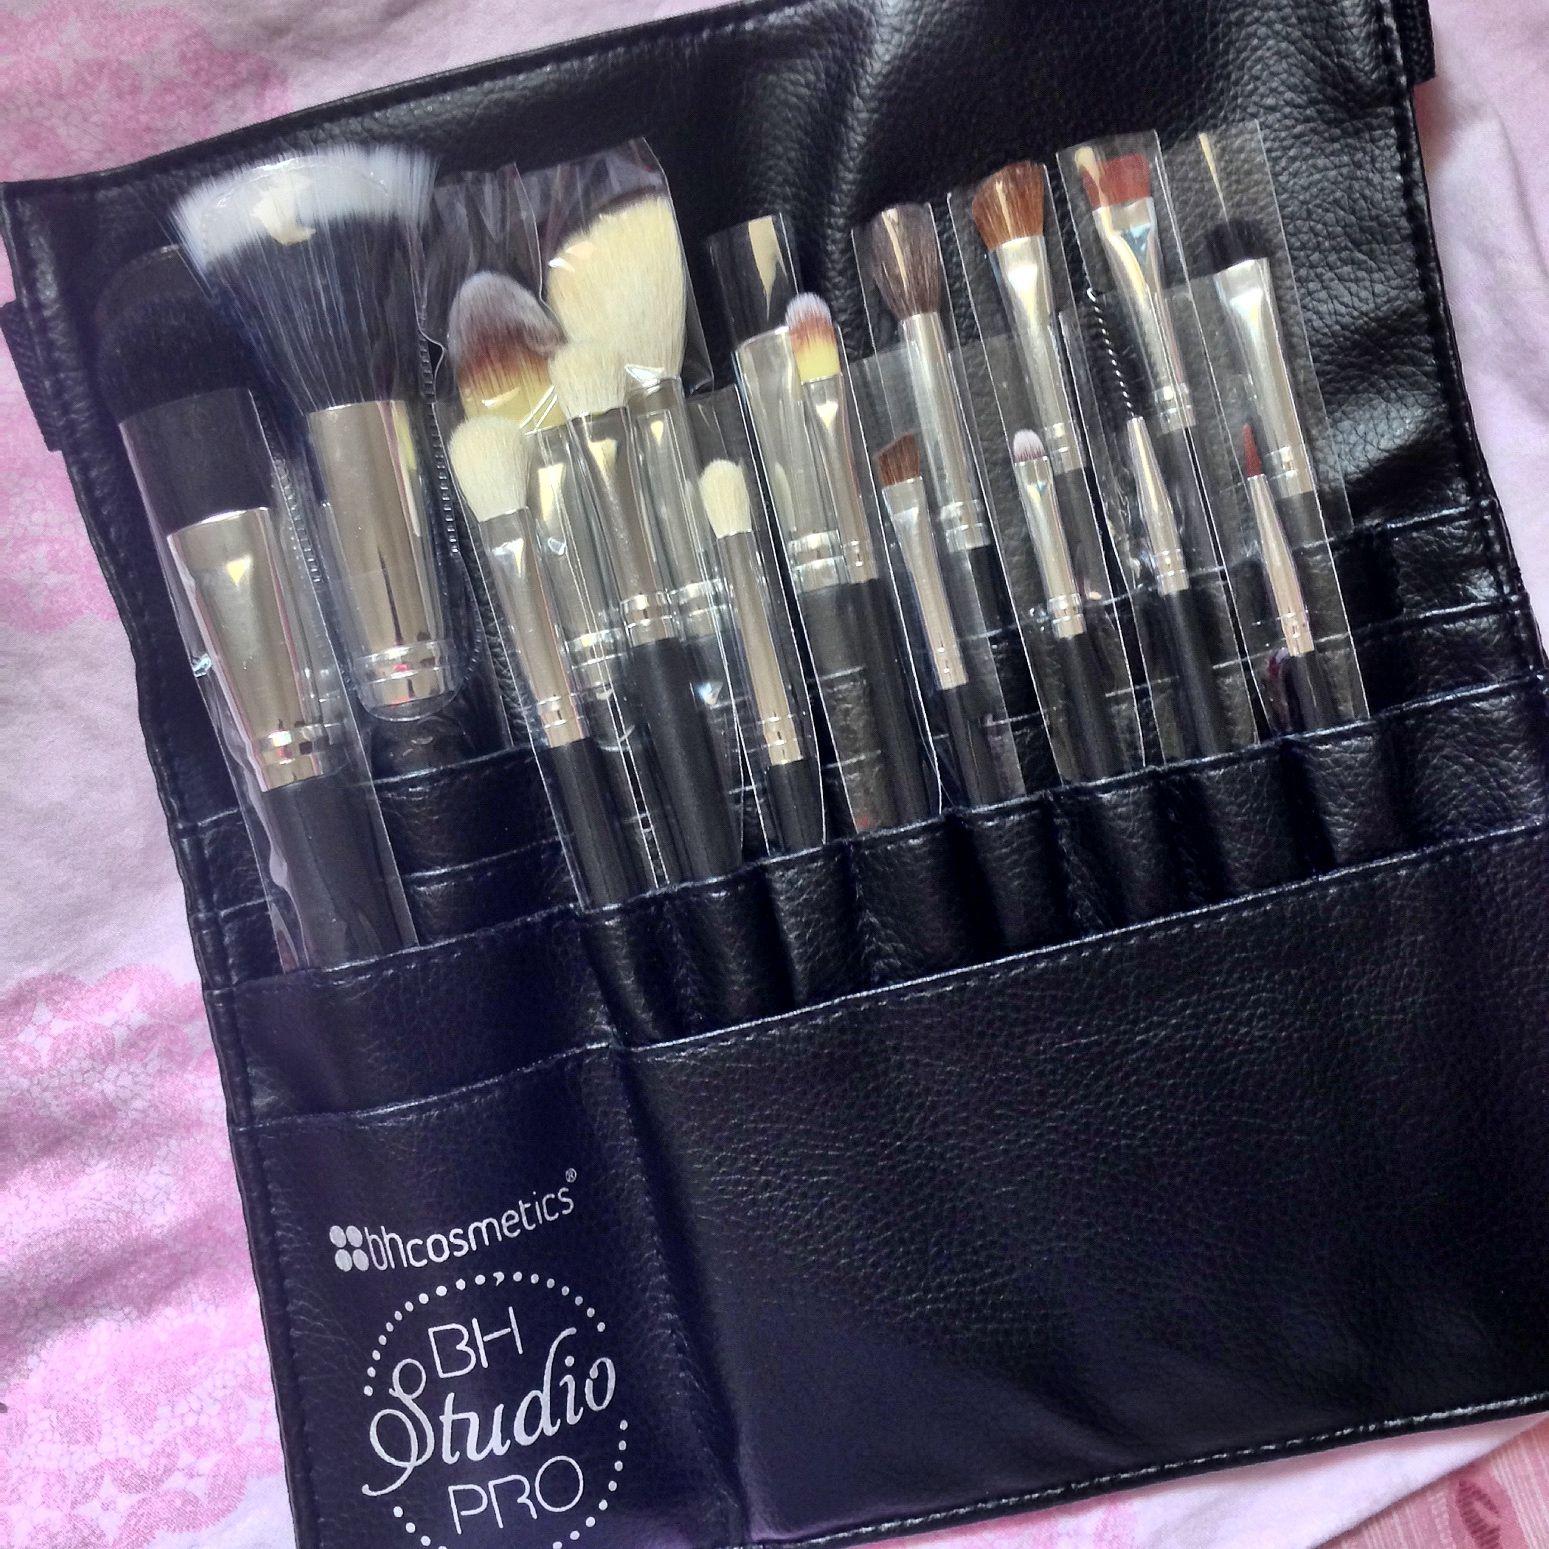 Studio Pro Brush 10 by BH Cosmetics #21